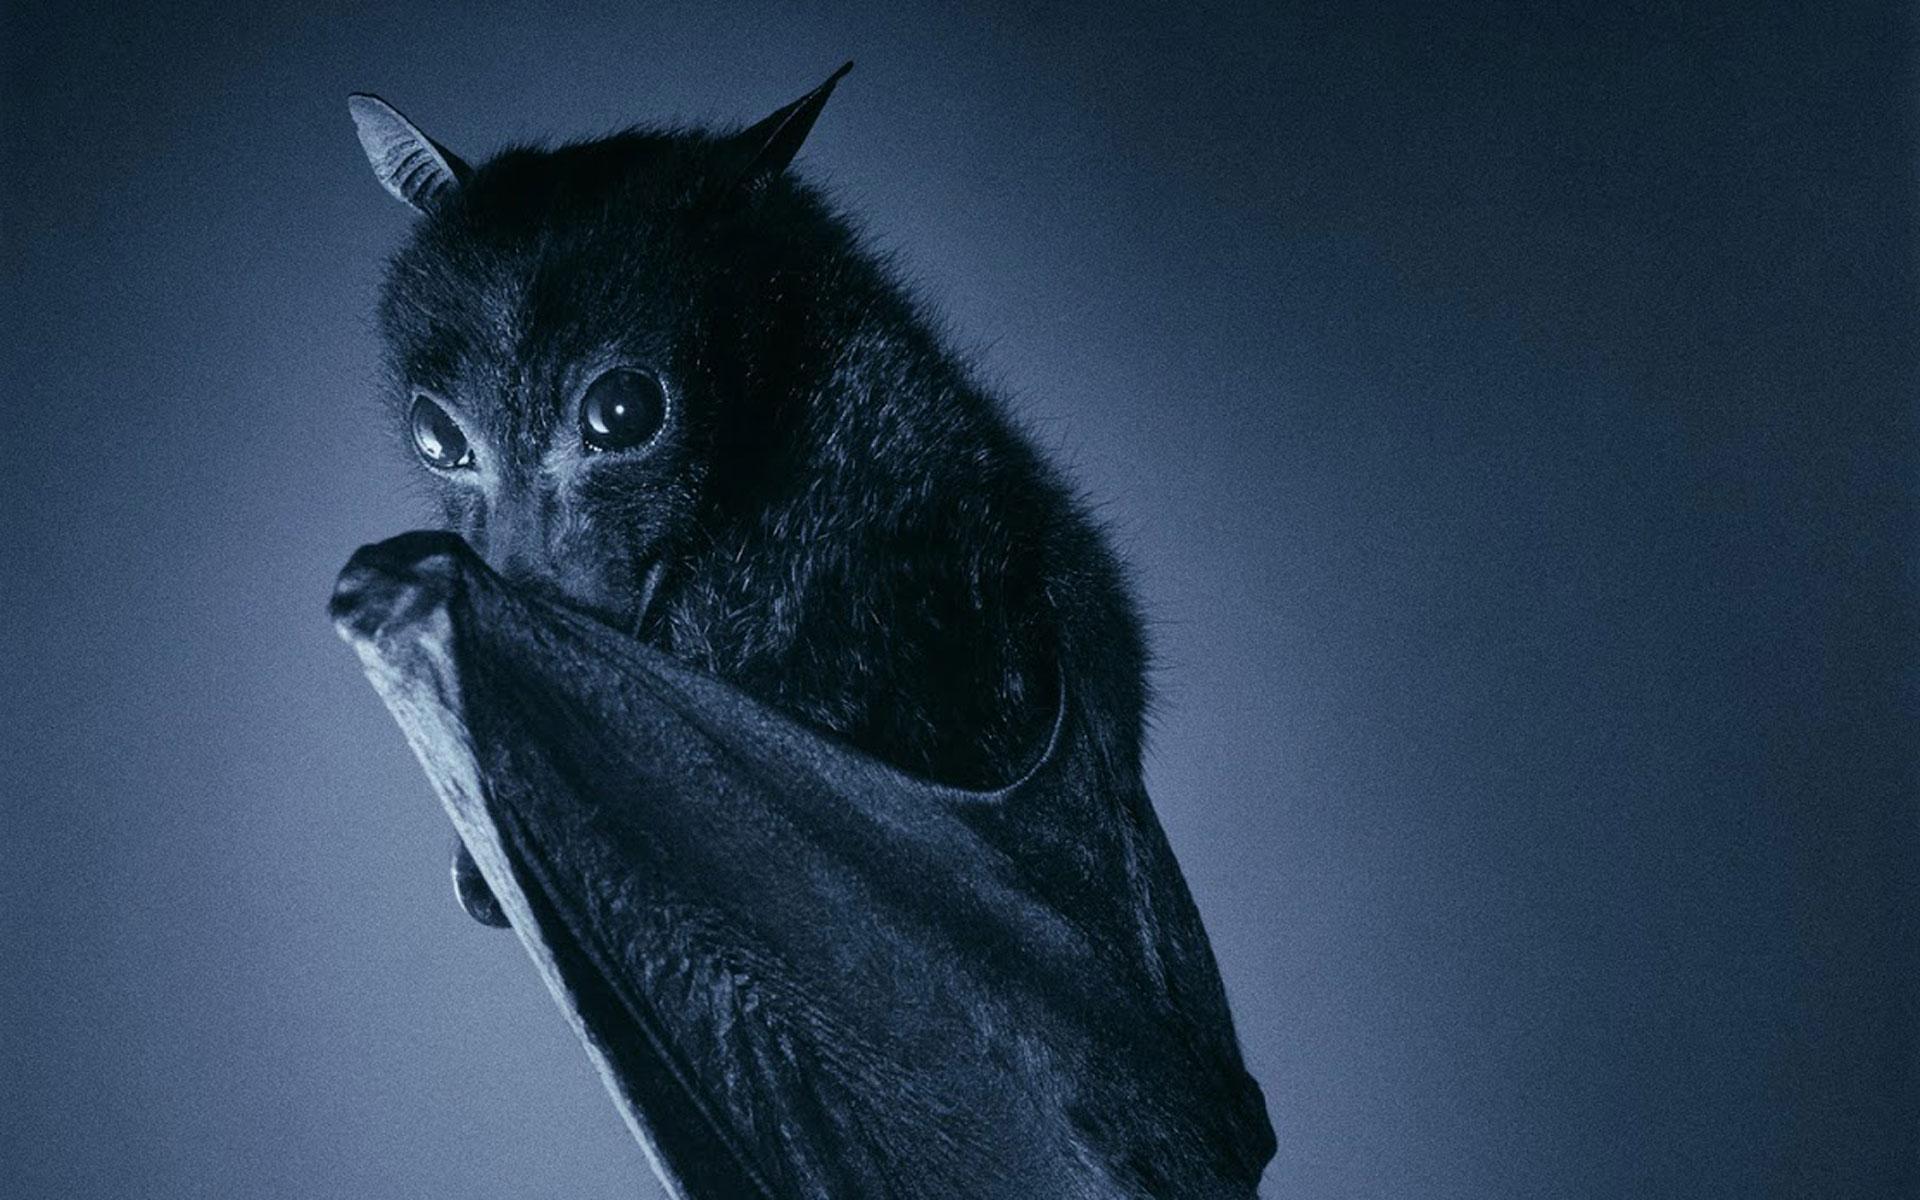 wallpaper.wiki-Bat-Computer-Background-for-Desktop-PIC-